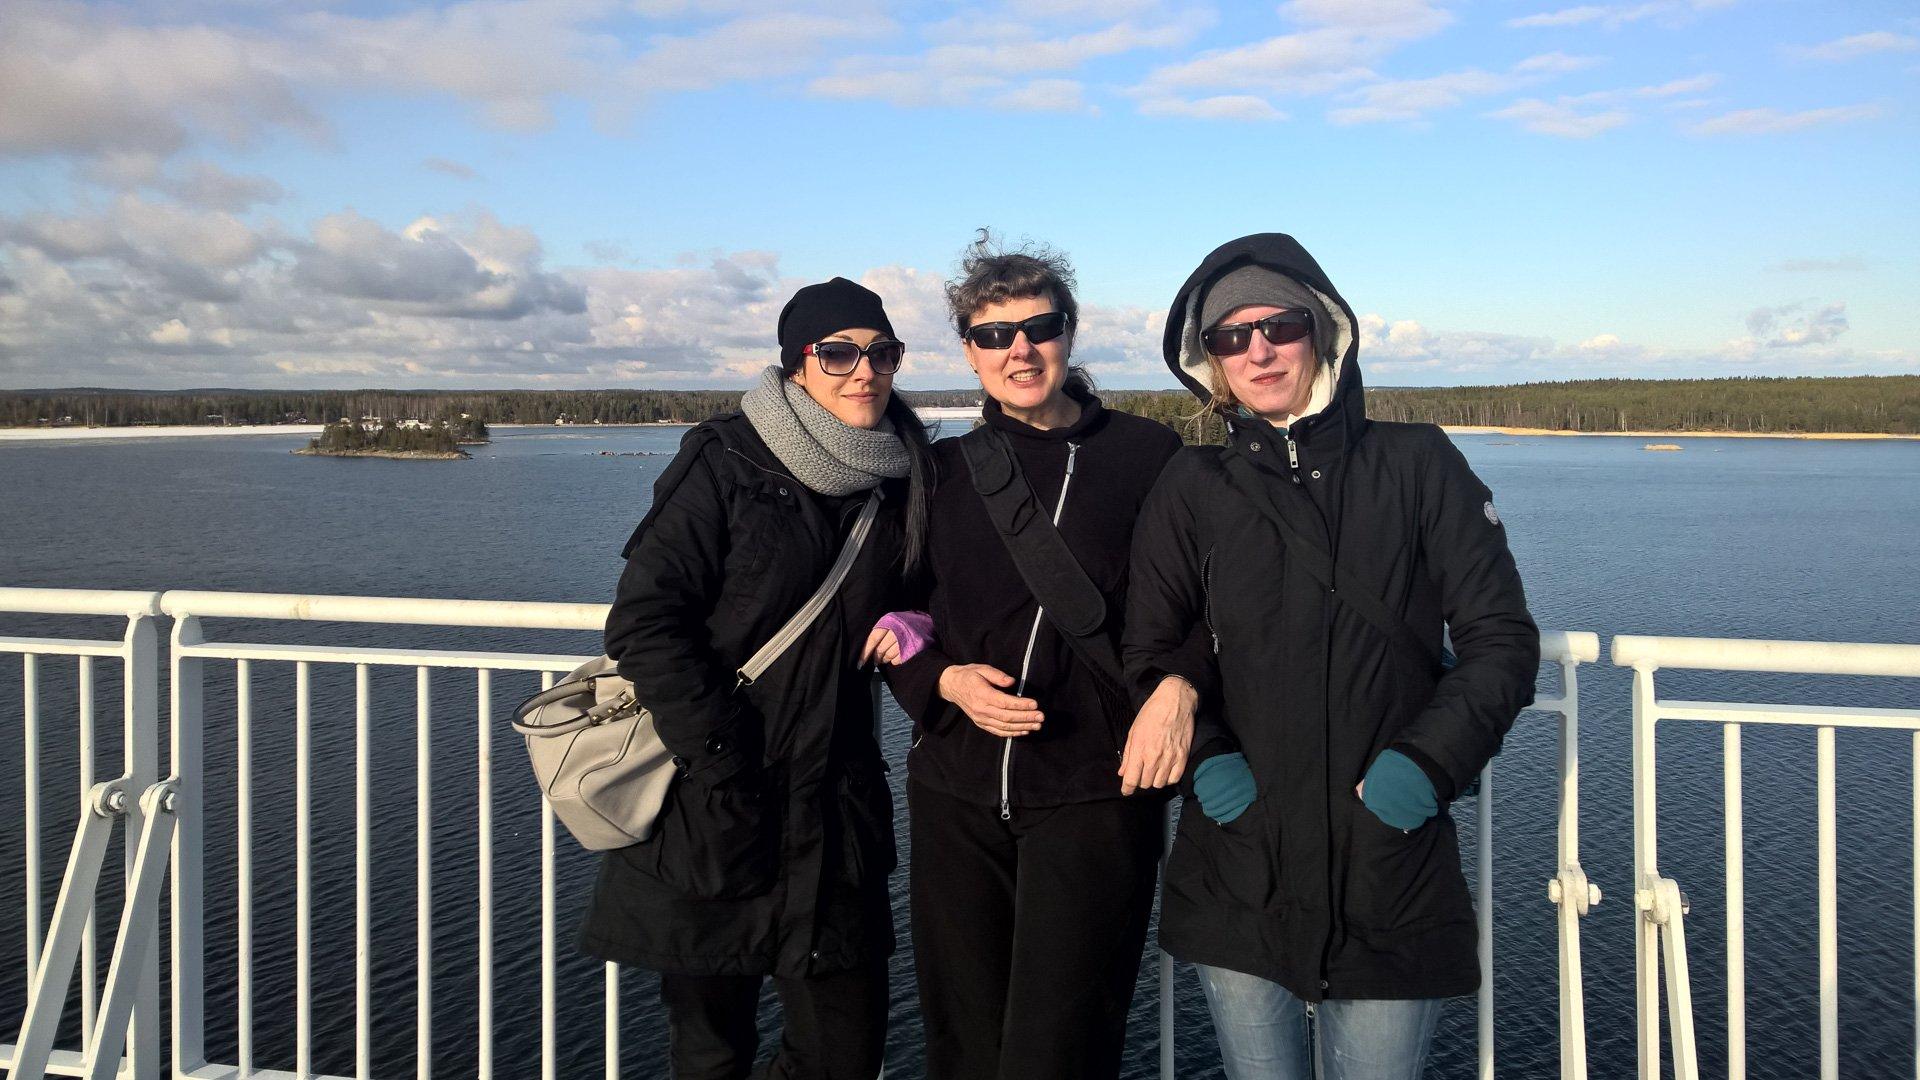 vpPHOTOGRAPHY_170331_Helsinki_WEB_0013